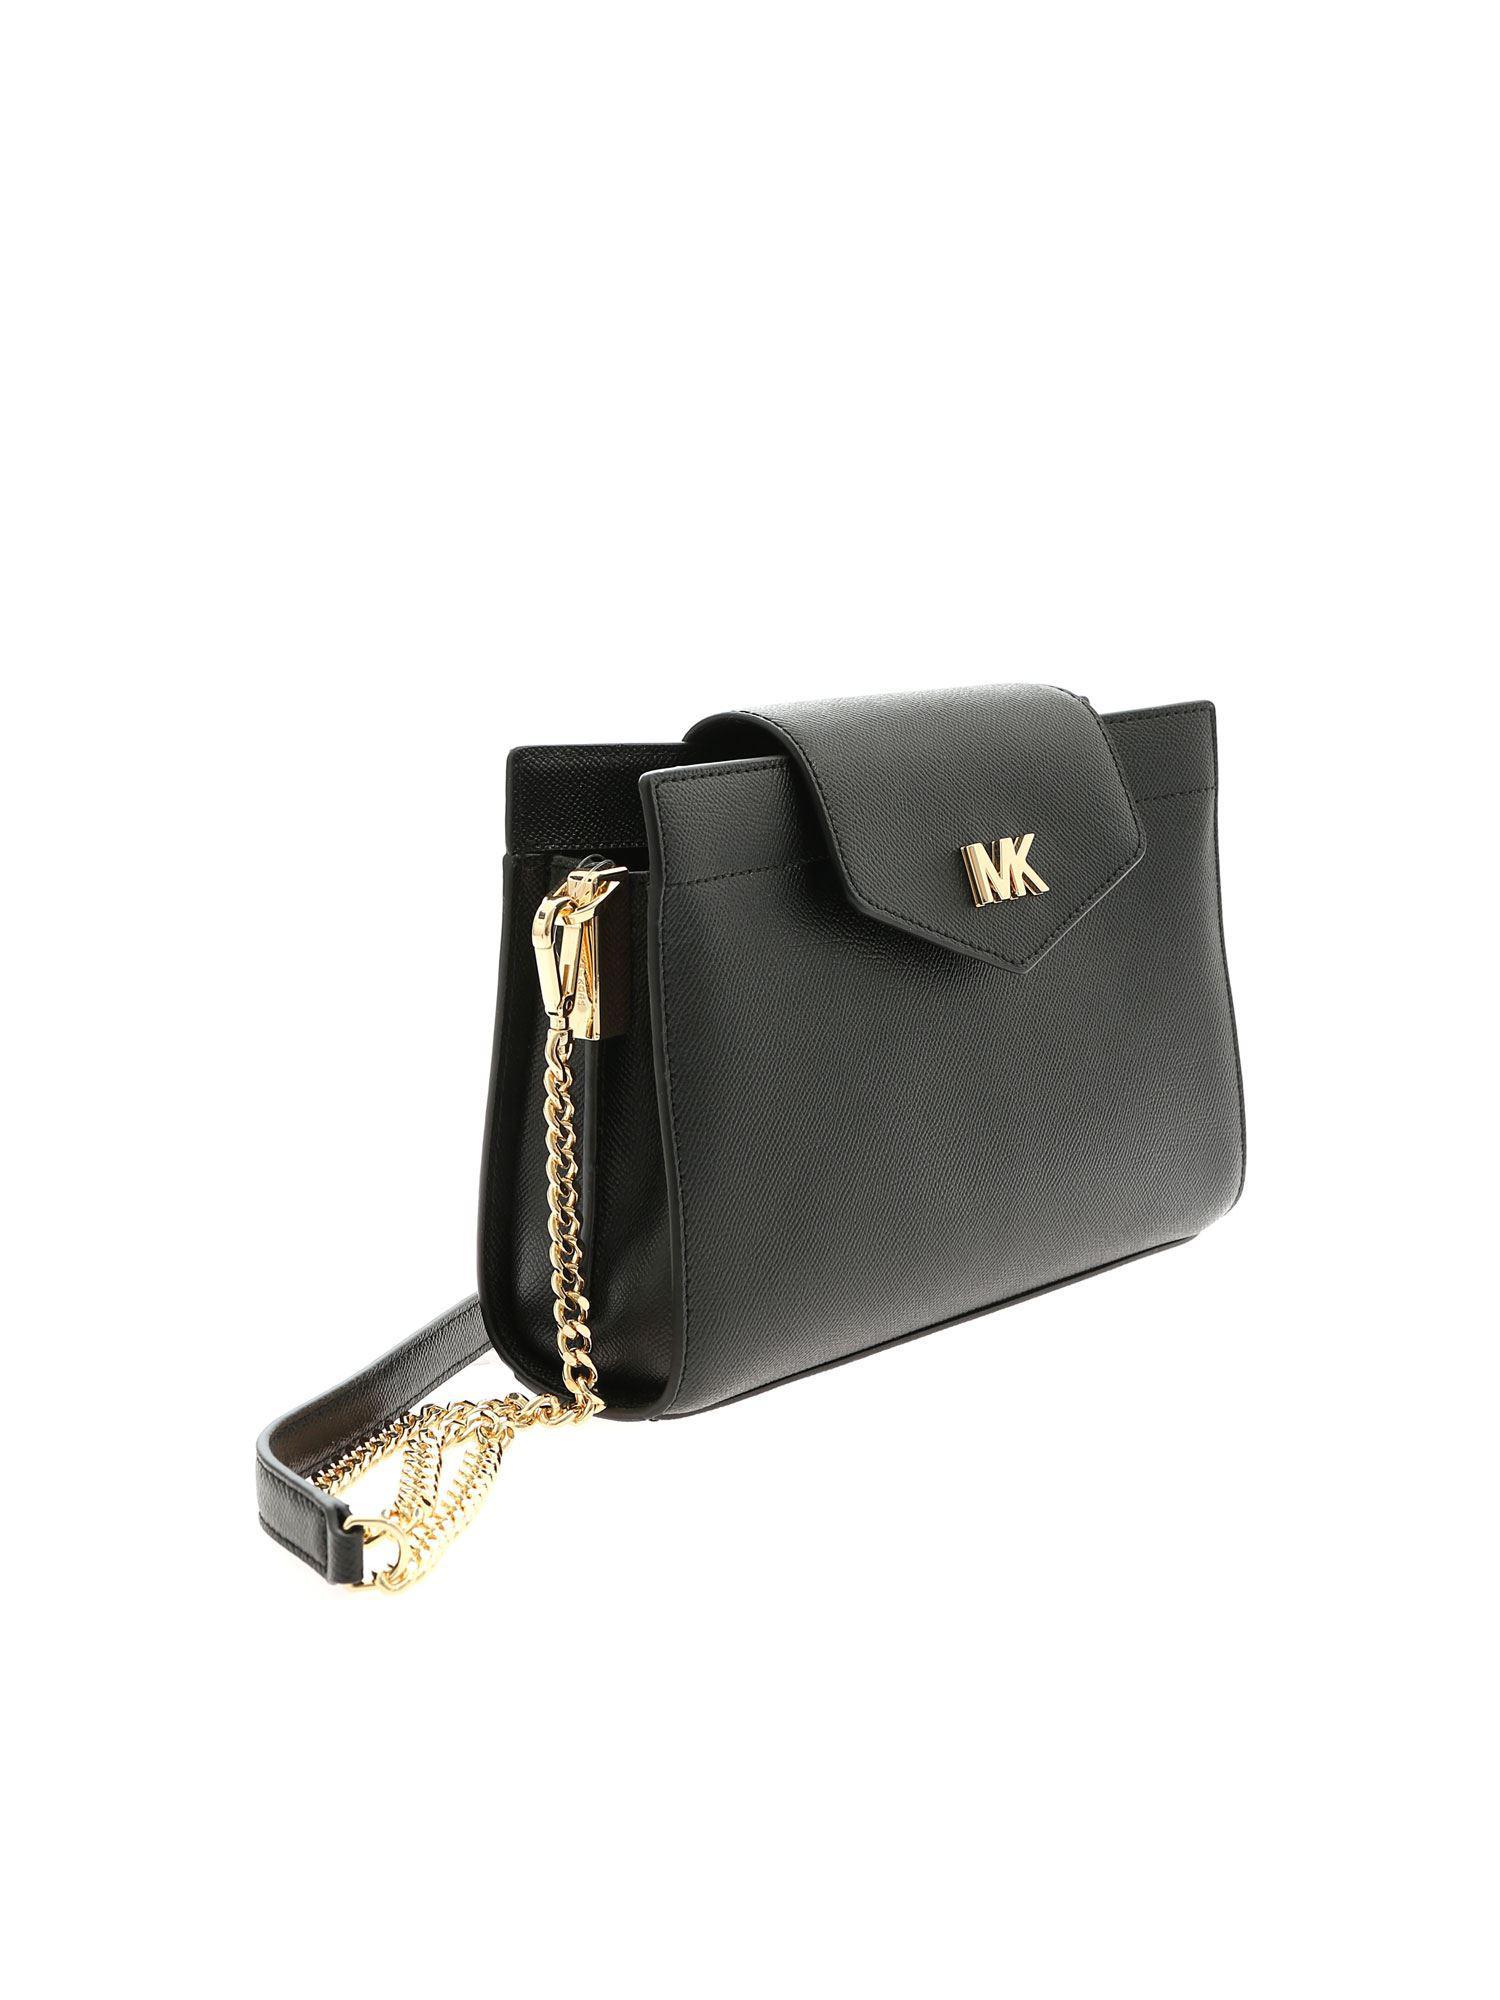 b1a99907d9f3 Lyst - Michael Kors Black Crossbody Bag in Black